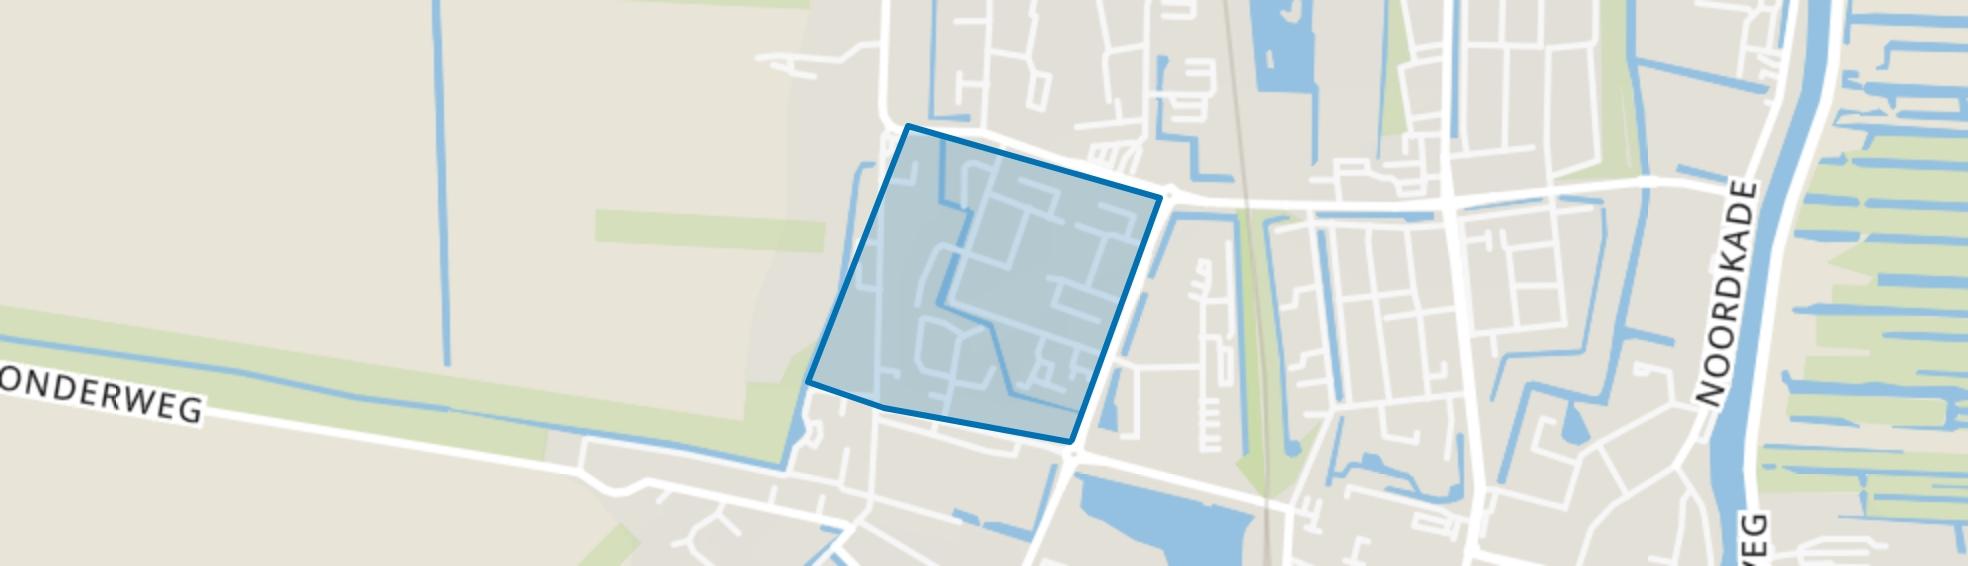 Groenswaard 1, Waddinxveen map